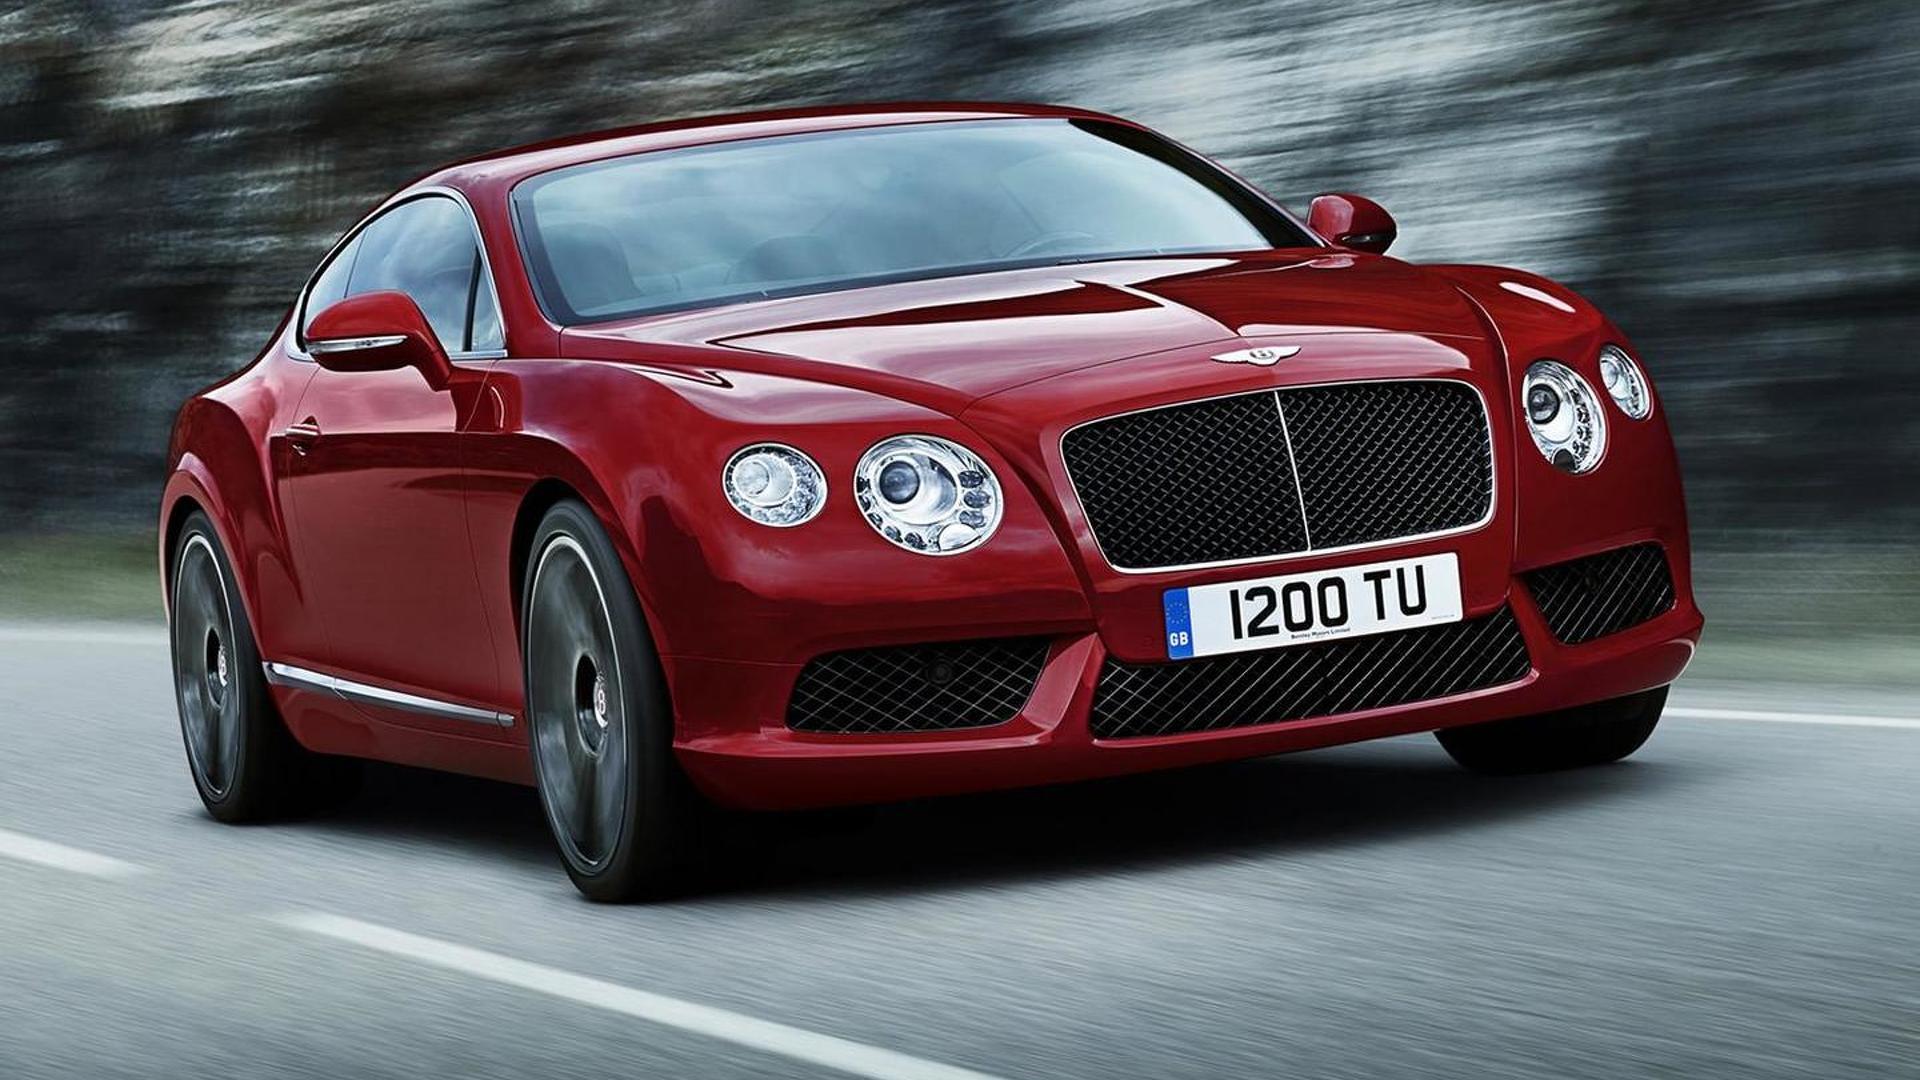 Bentley Continental GT V8 / GTC V8 unveiled in Detroit [videos]